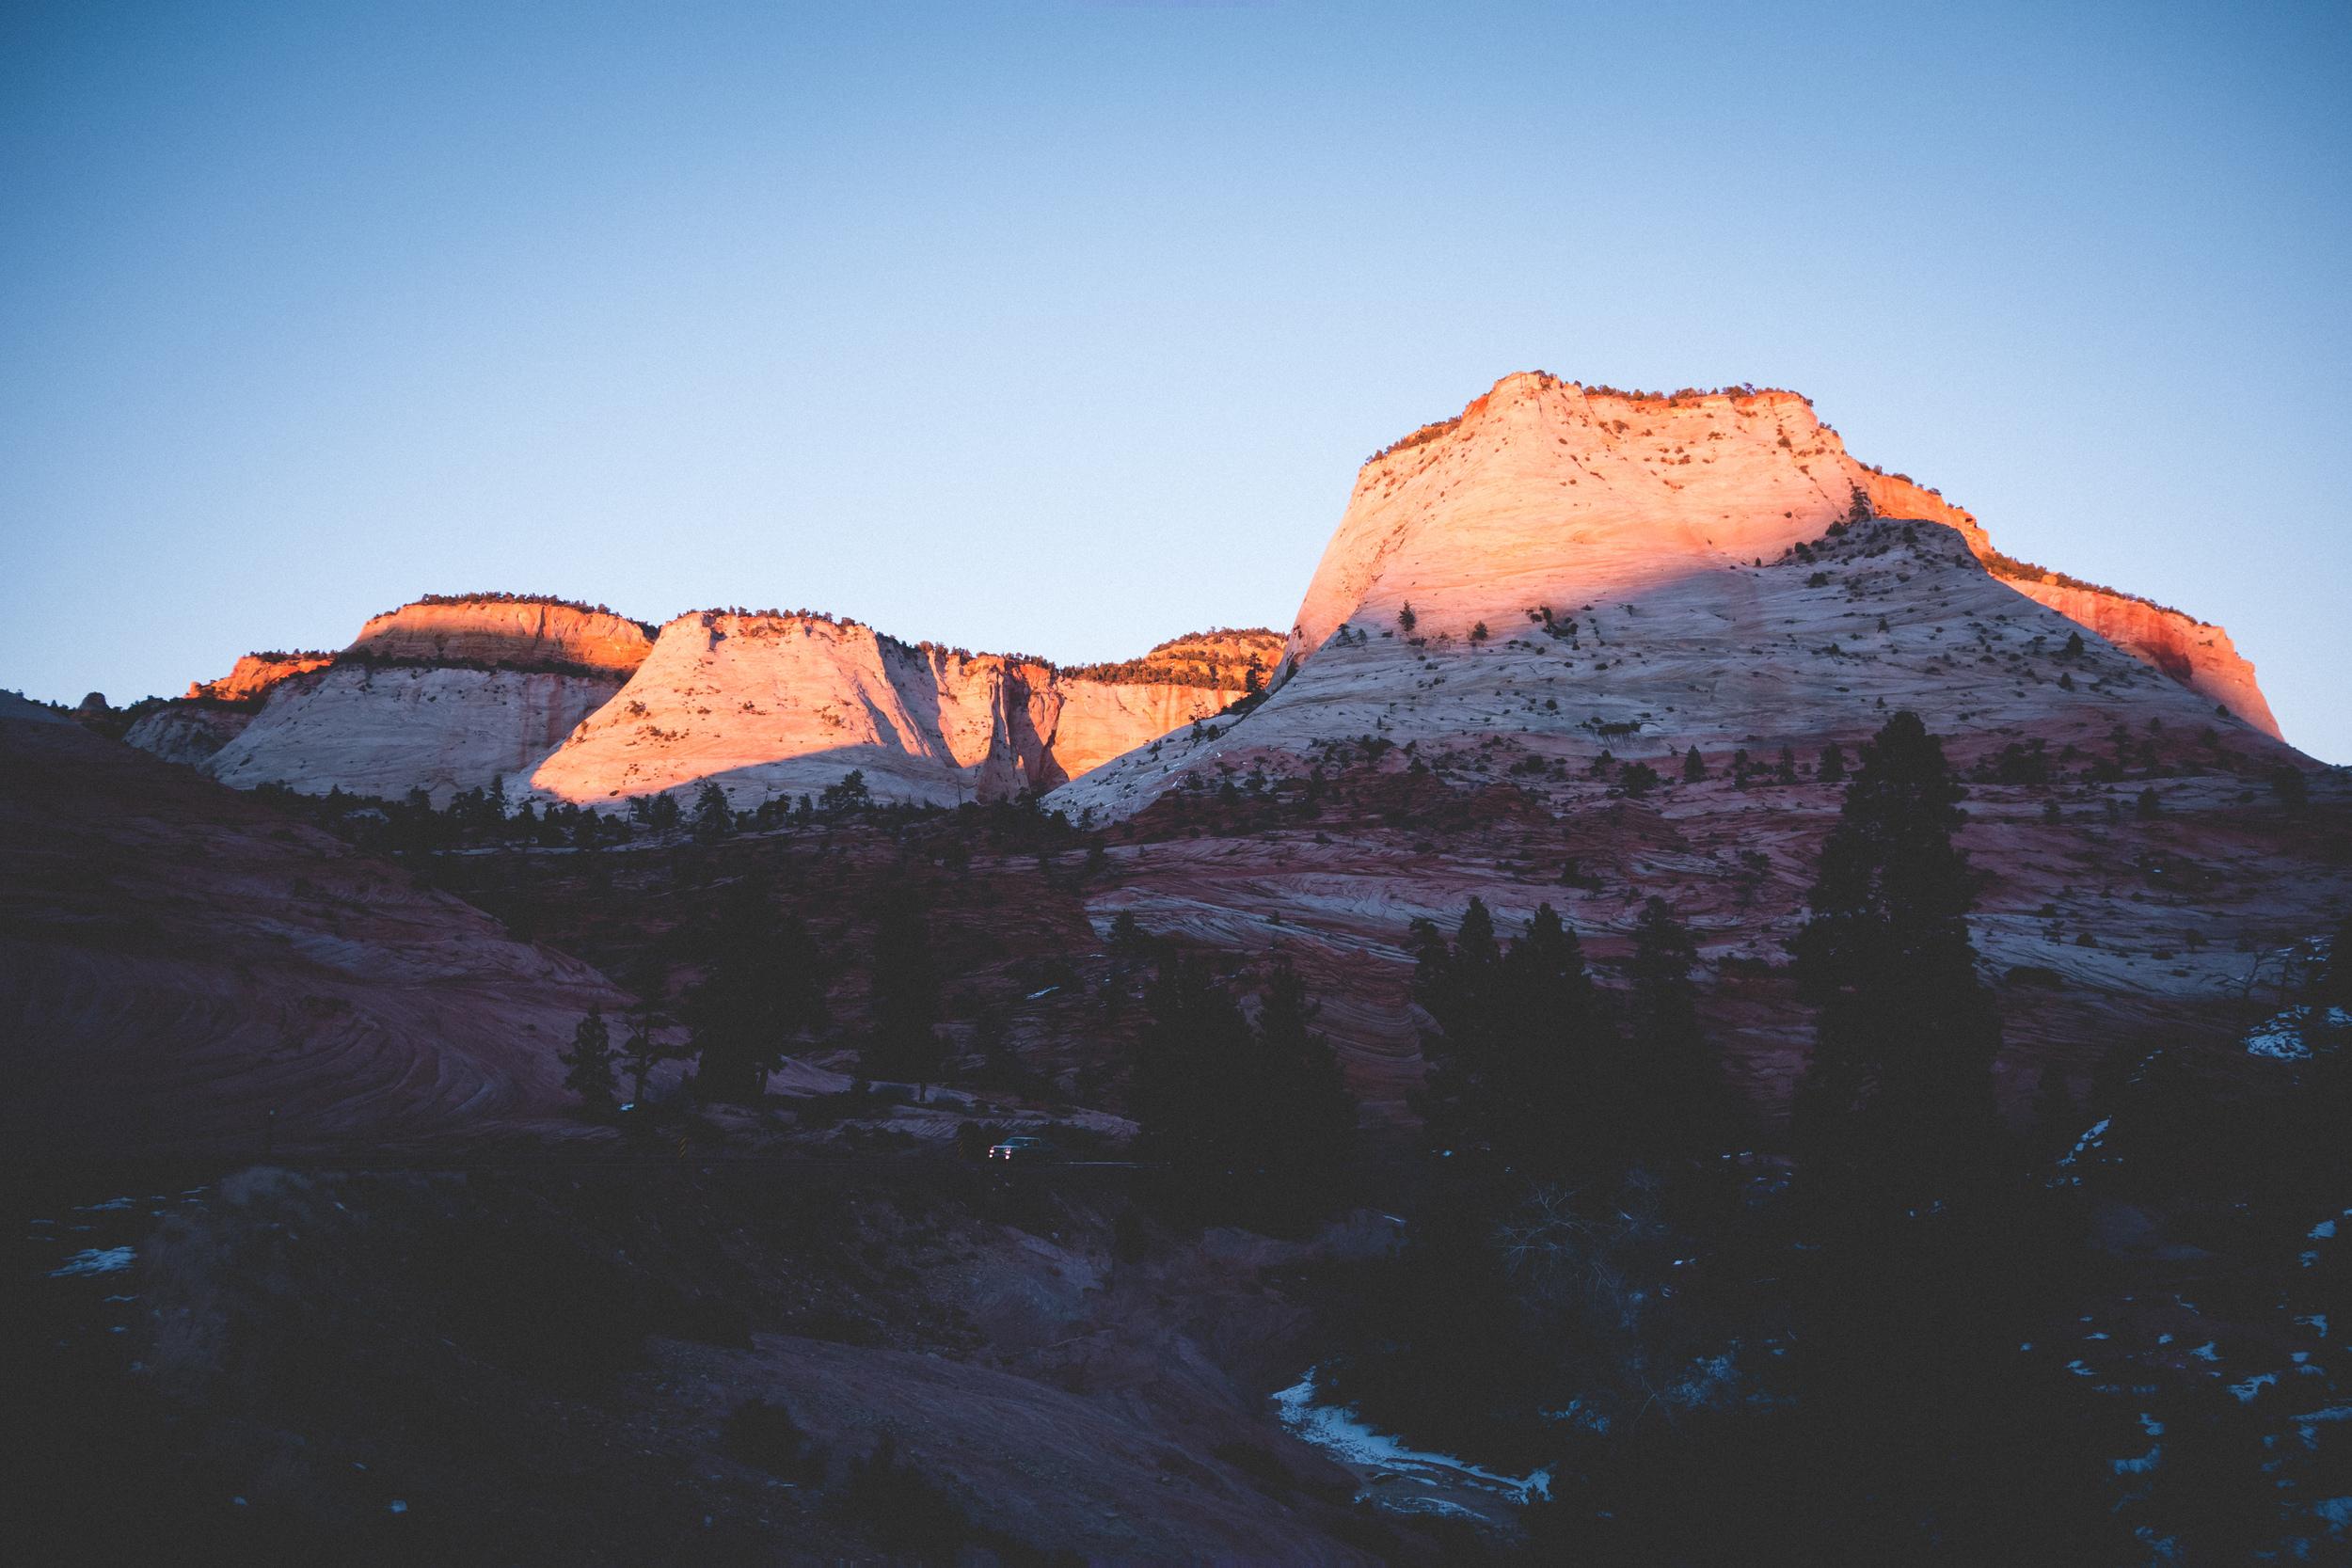 Zion-National-Park-46.jpg